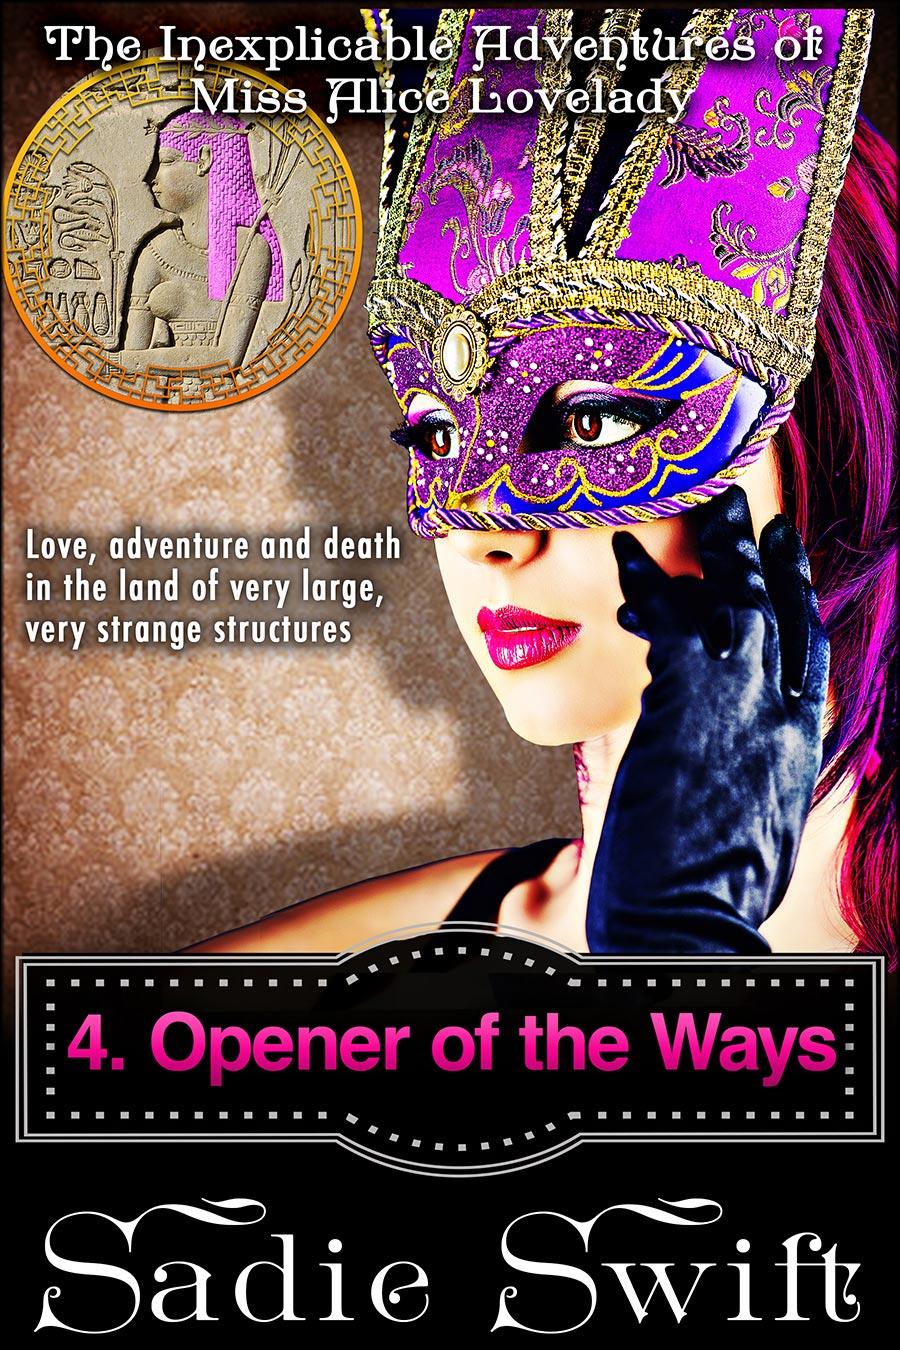 Miss-Alice-Lovelady--4.-Opener-of-the-Ways---draft-2.jpg